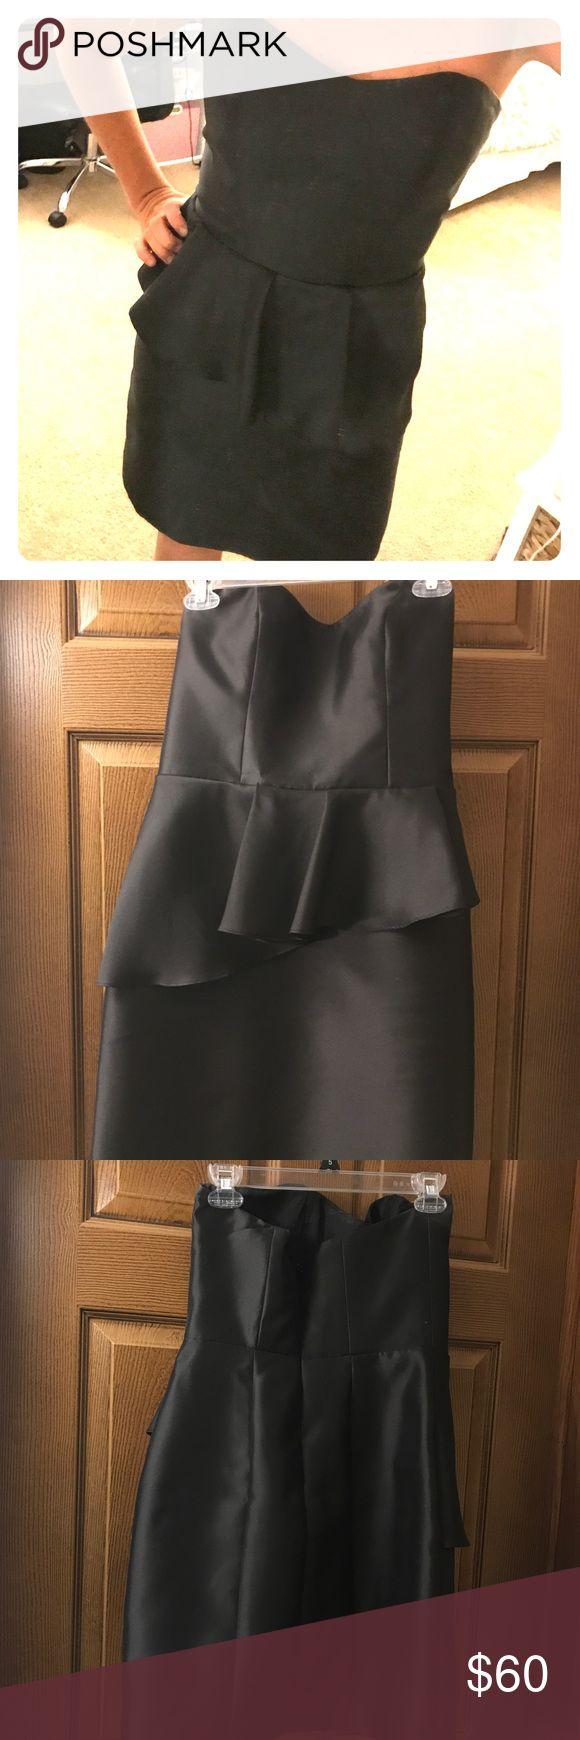 Dressy black peplum dress. Bridesmaid dress. EUC Super chic black cocktail dress with peplum around waist. Worn once. No stains or flaws. Dresses Wedding